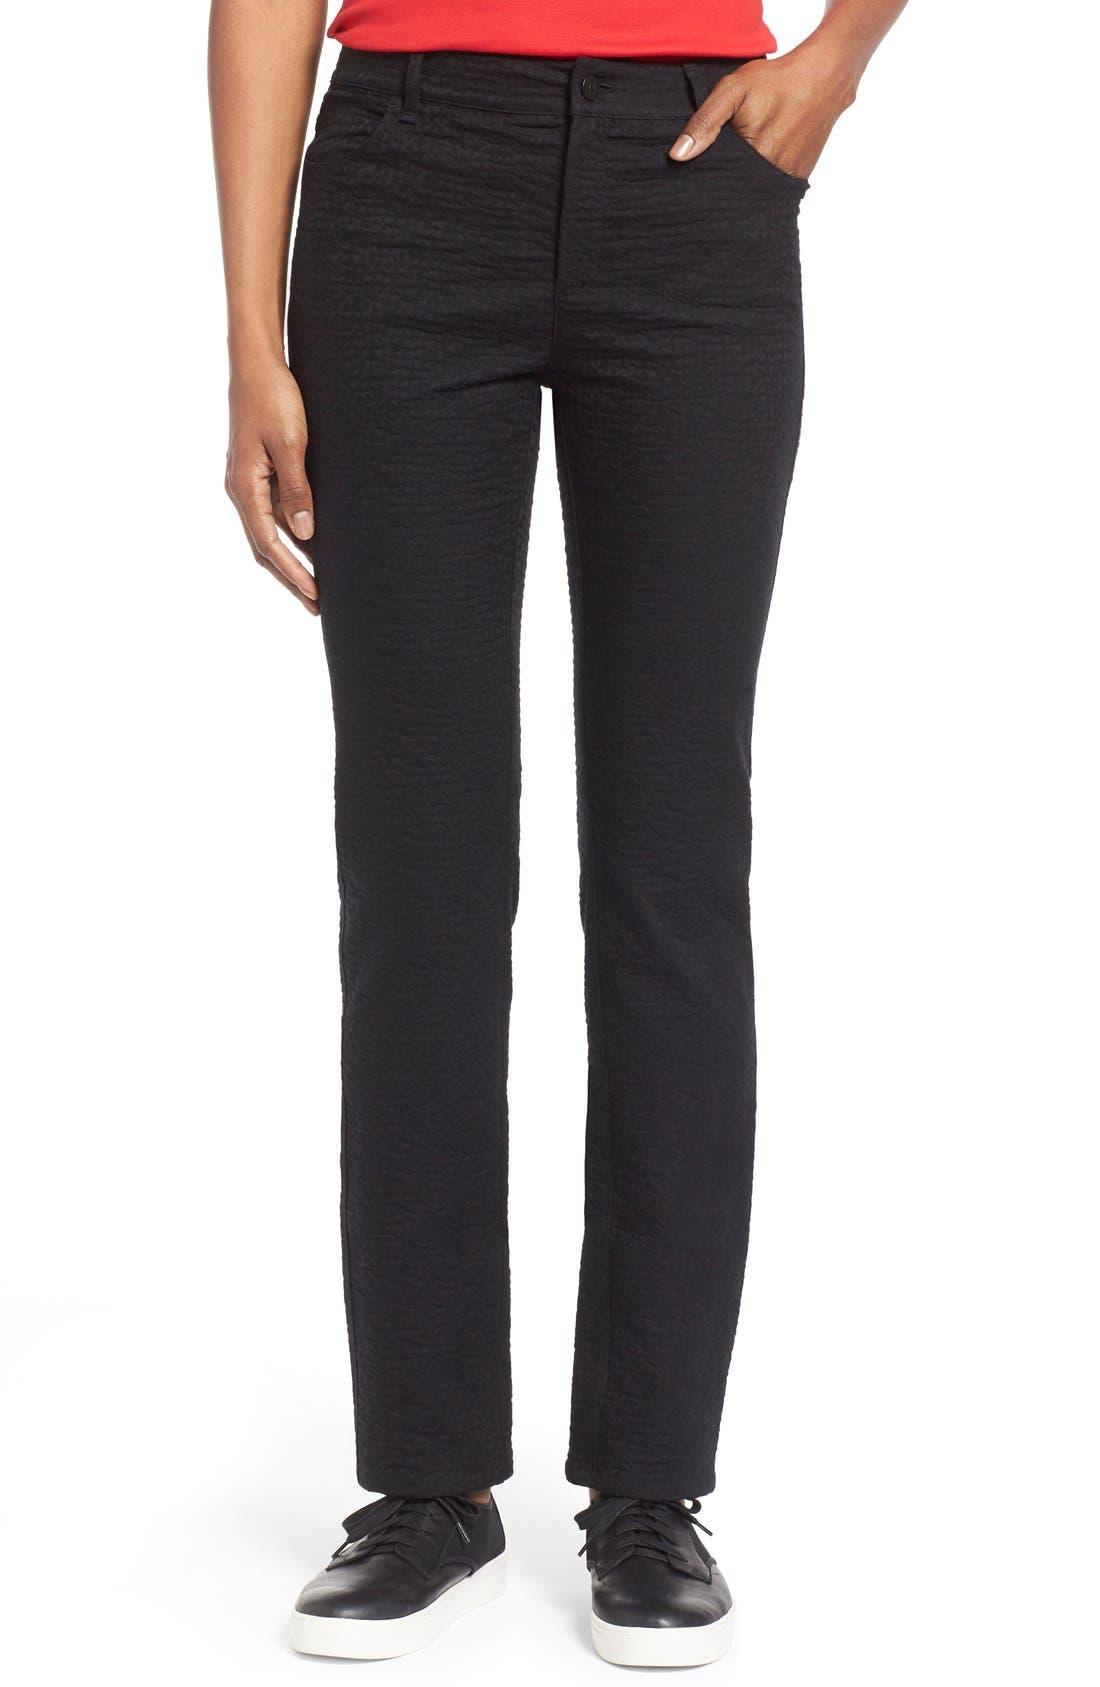 Lafayette 148 New York Curvy Fit Jacquard Stretch Slim Leg Jeans (Black) (Regular & Petite)